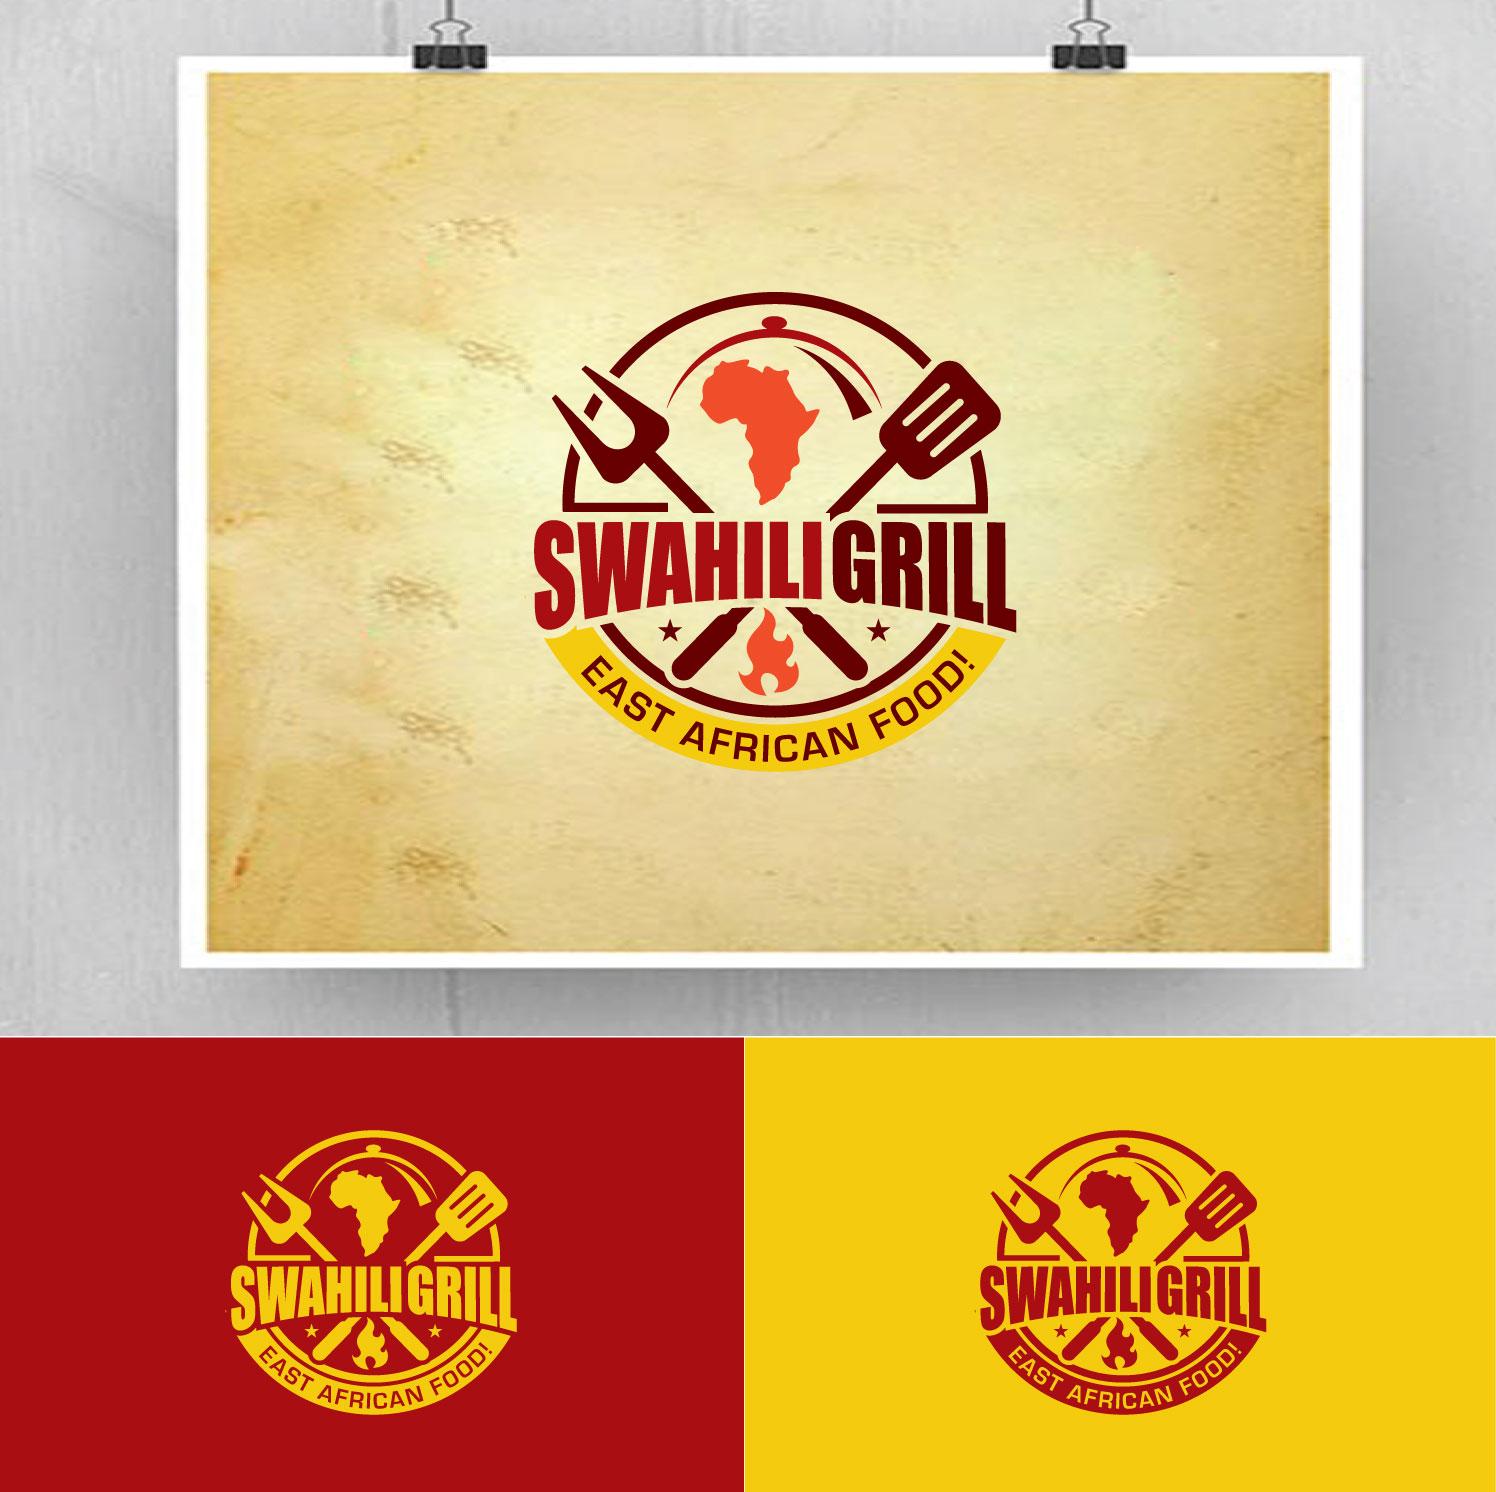 Moderno Vistoso Restaurant Diseno De Logo For Swahili Grill Por Fourtunedesign Diseno 18546816